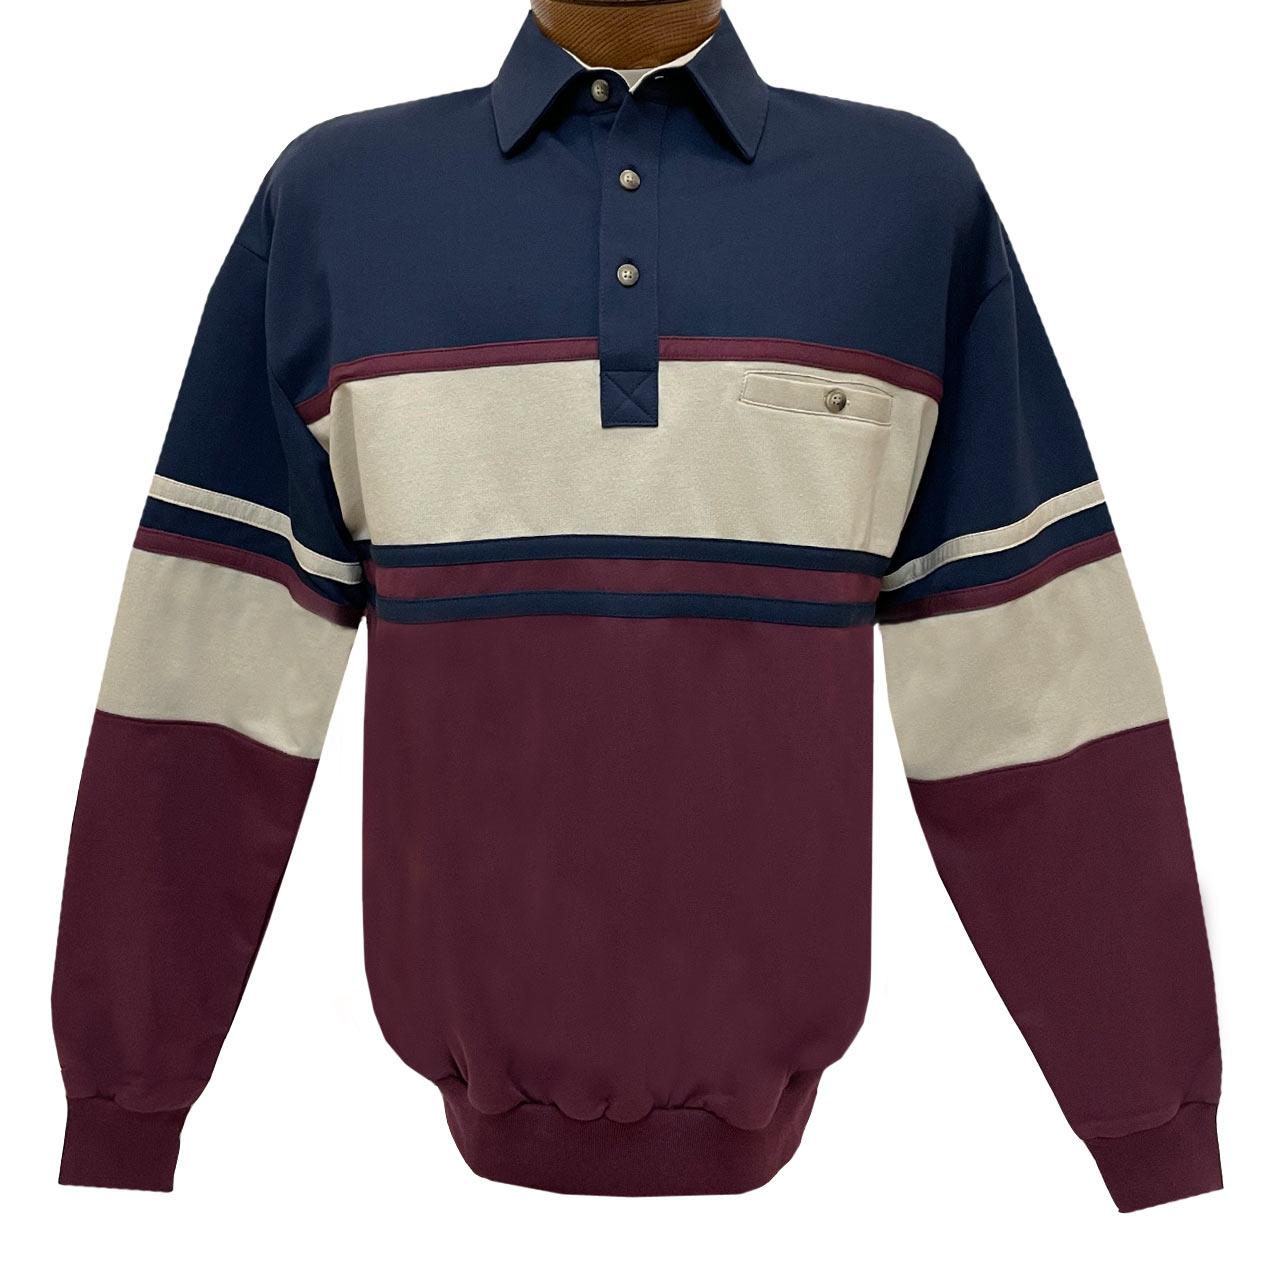 Men's Classics-LD Sport By Palmland Long Sleeve Tailored Collar Horizontal Pieced Banded Bottom Shirt #6094-450 Navy